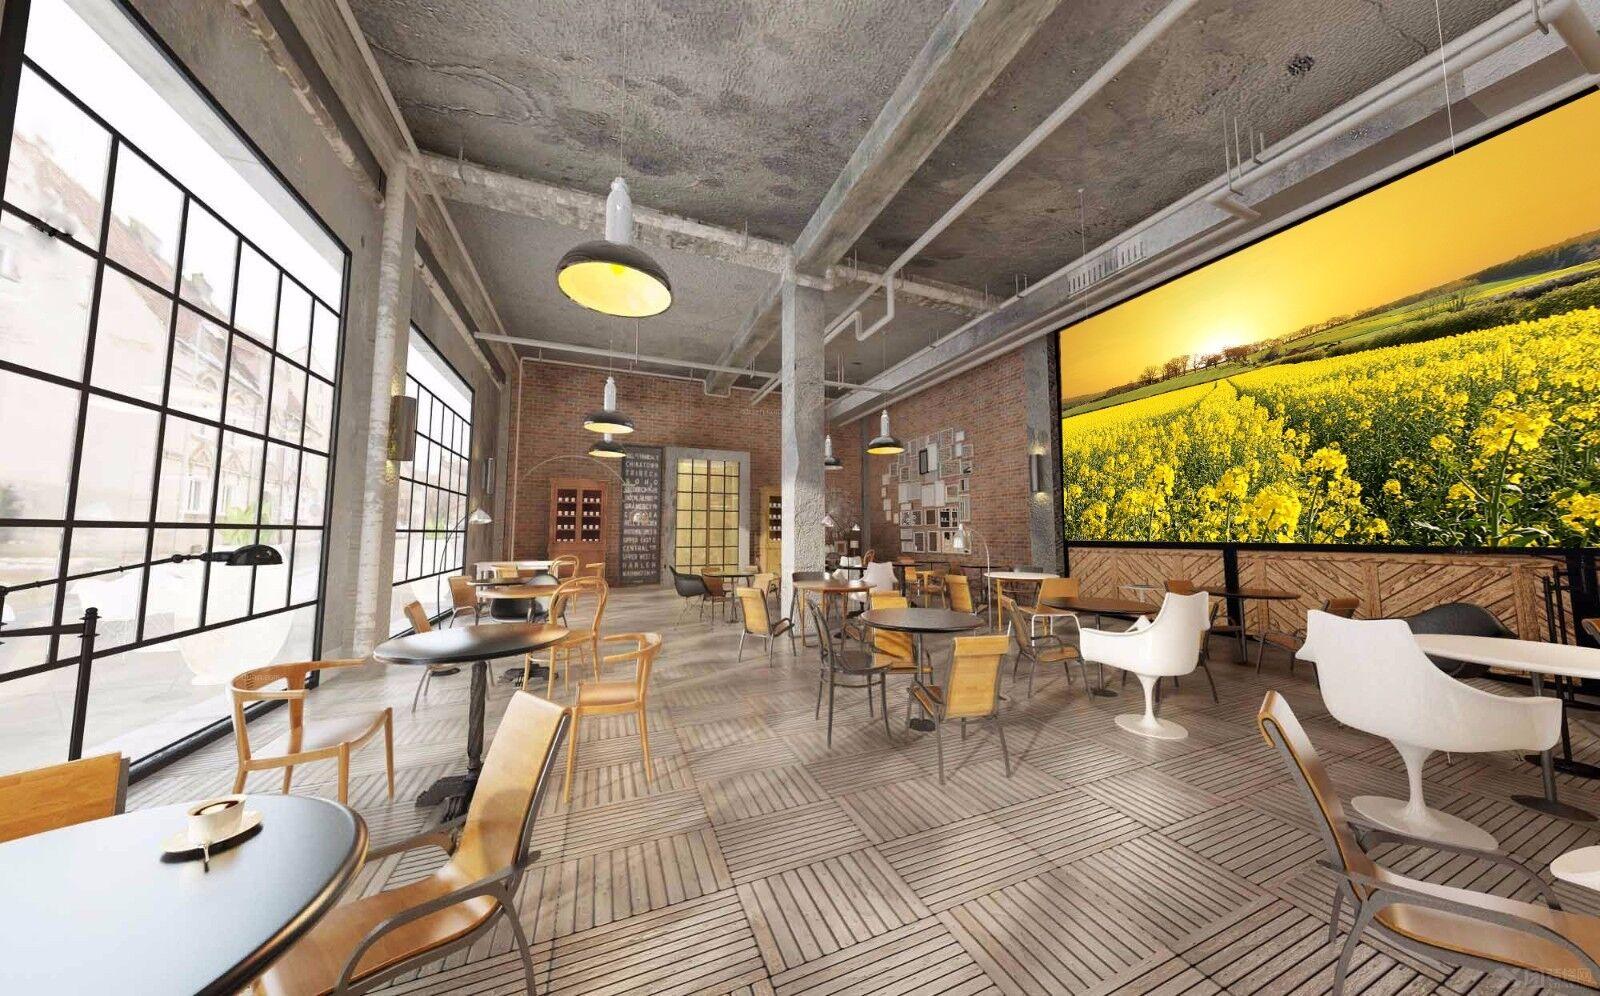 3D Rape Field 428 Wallpaper Murals Wall Print Wallpaper Mural AJ WALL AU Lemon